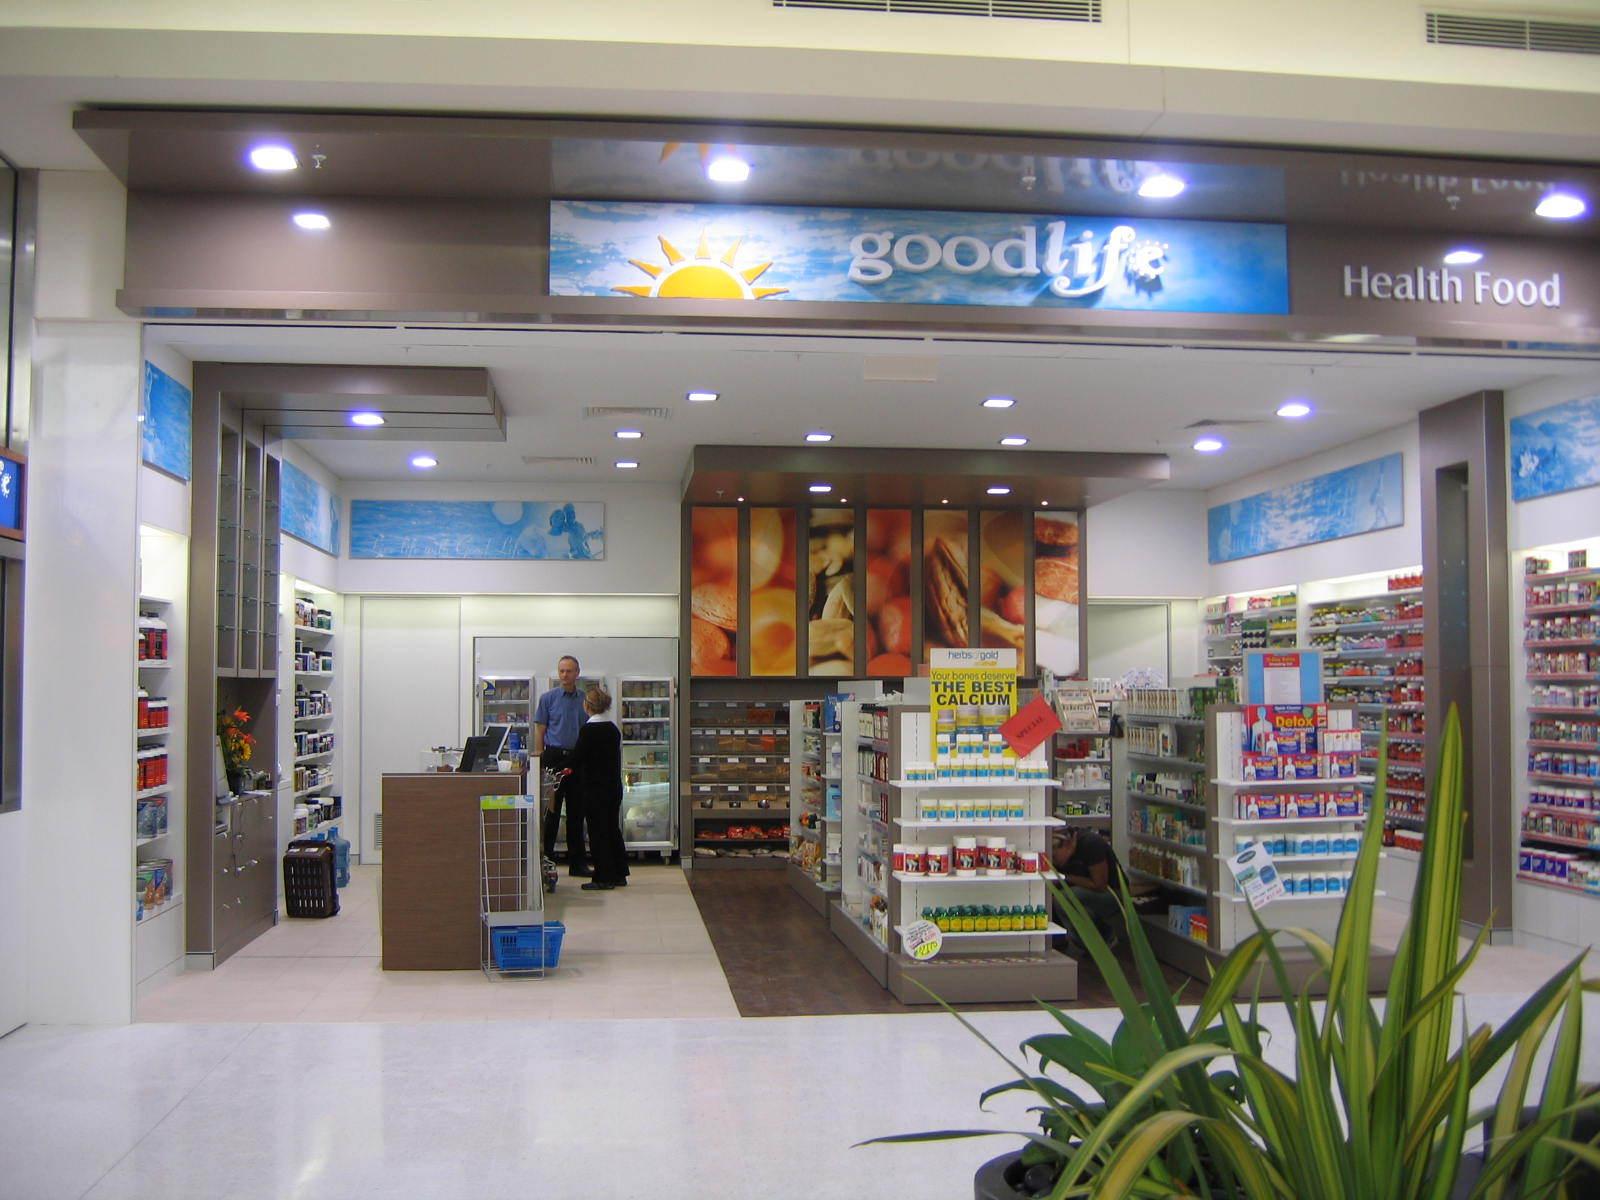 Good life Health Foods [Concept Store] - Westfield Innaloo. W.Australia